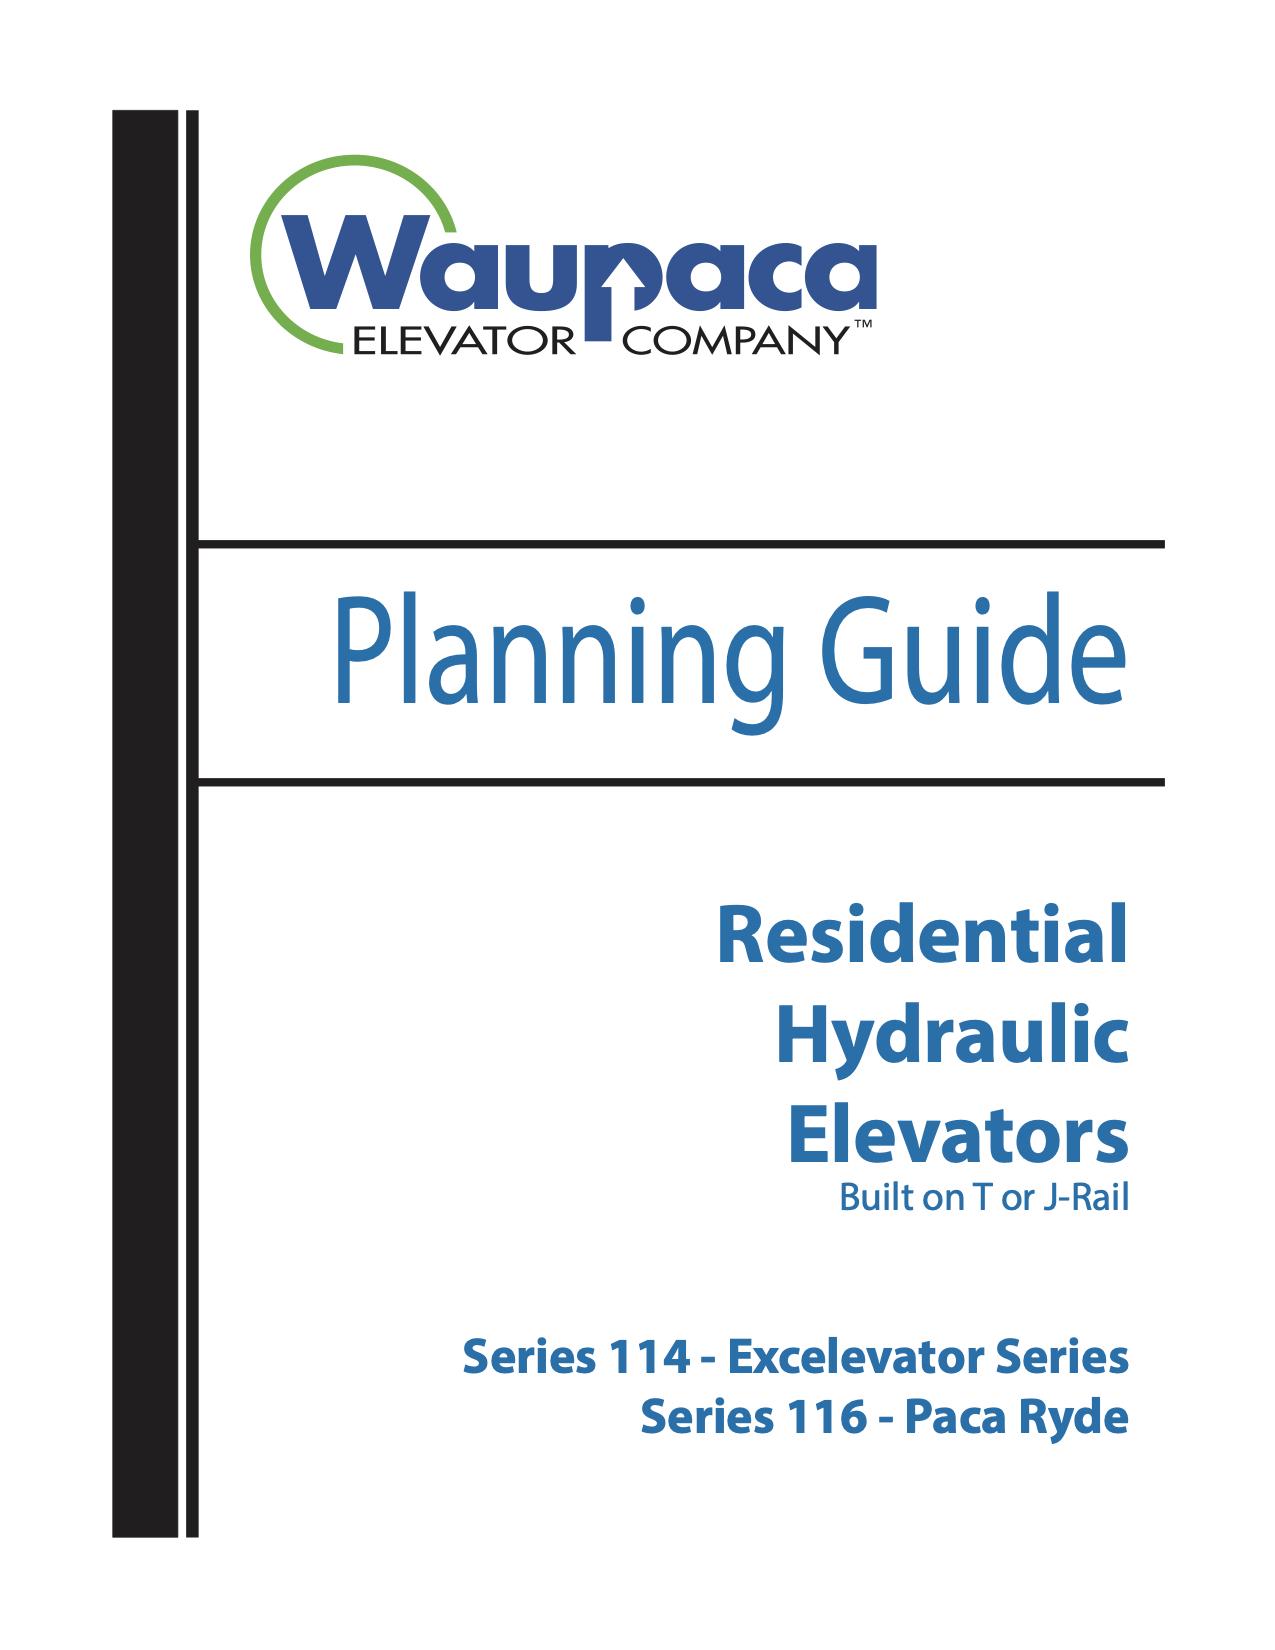 Waupaca ResidentialPaca-Ryde Elevator Brochure & Planning Guide Access Solutions